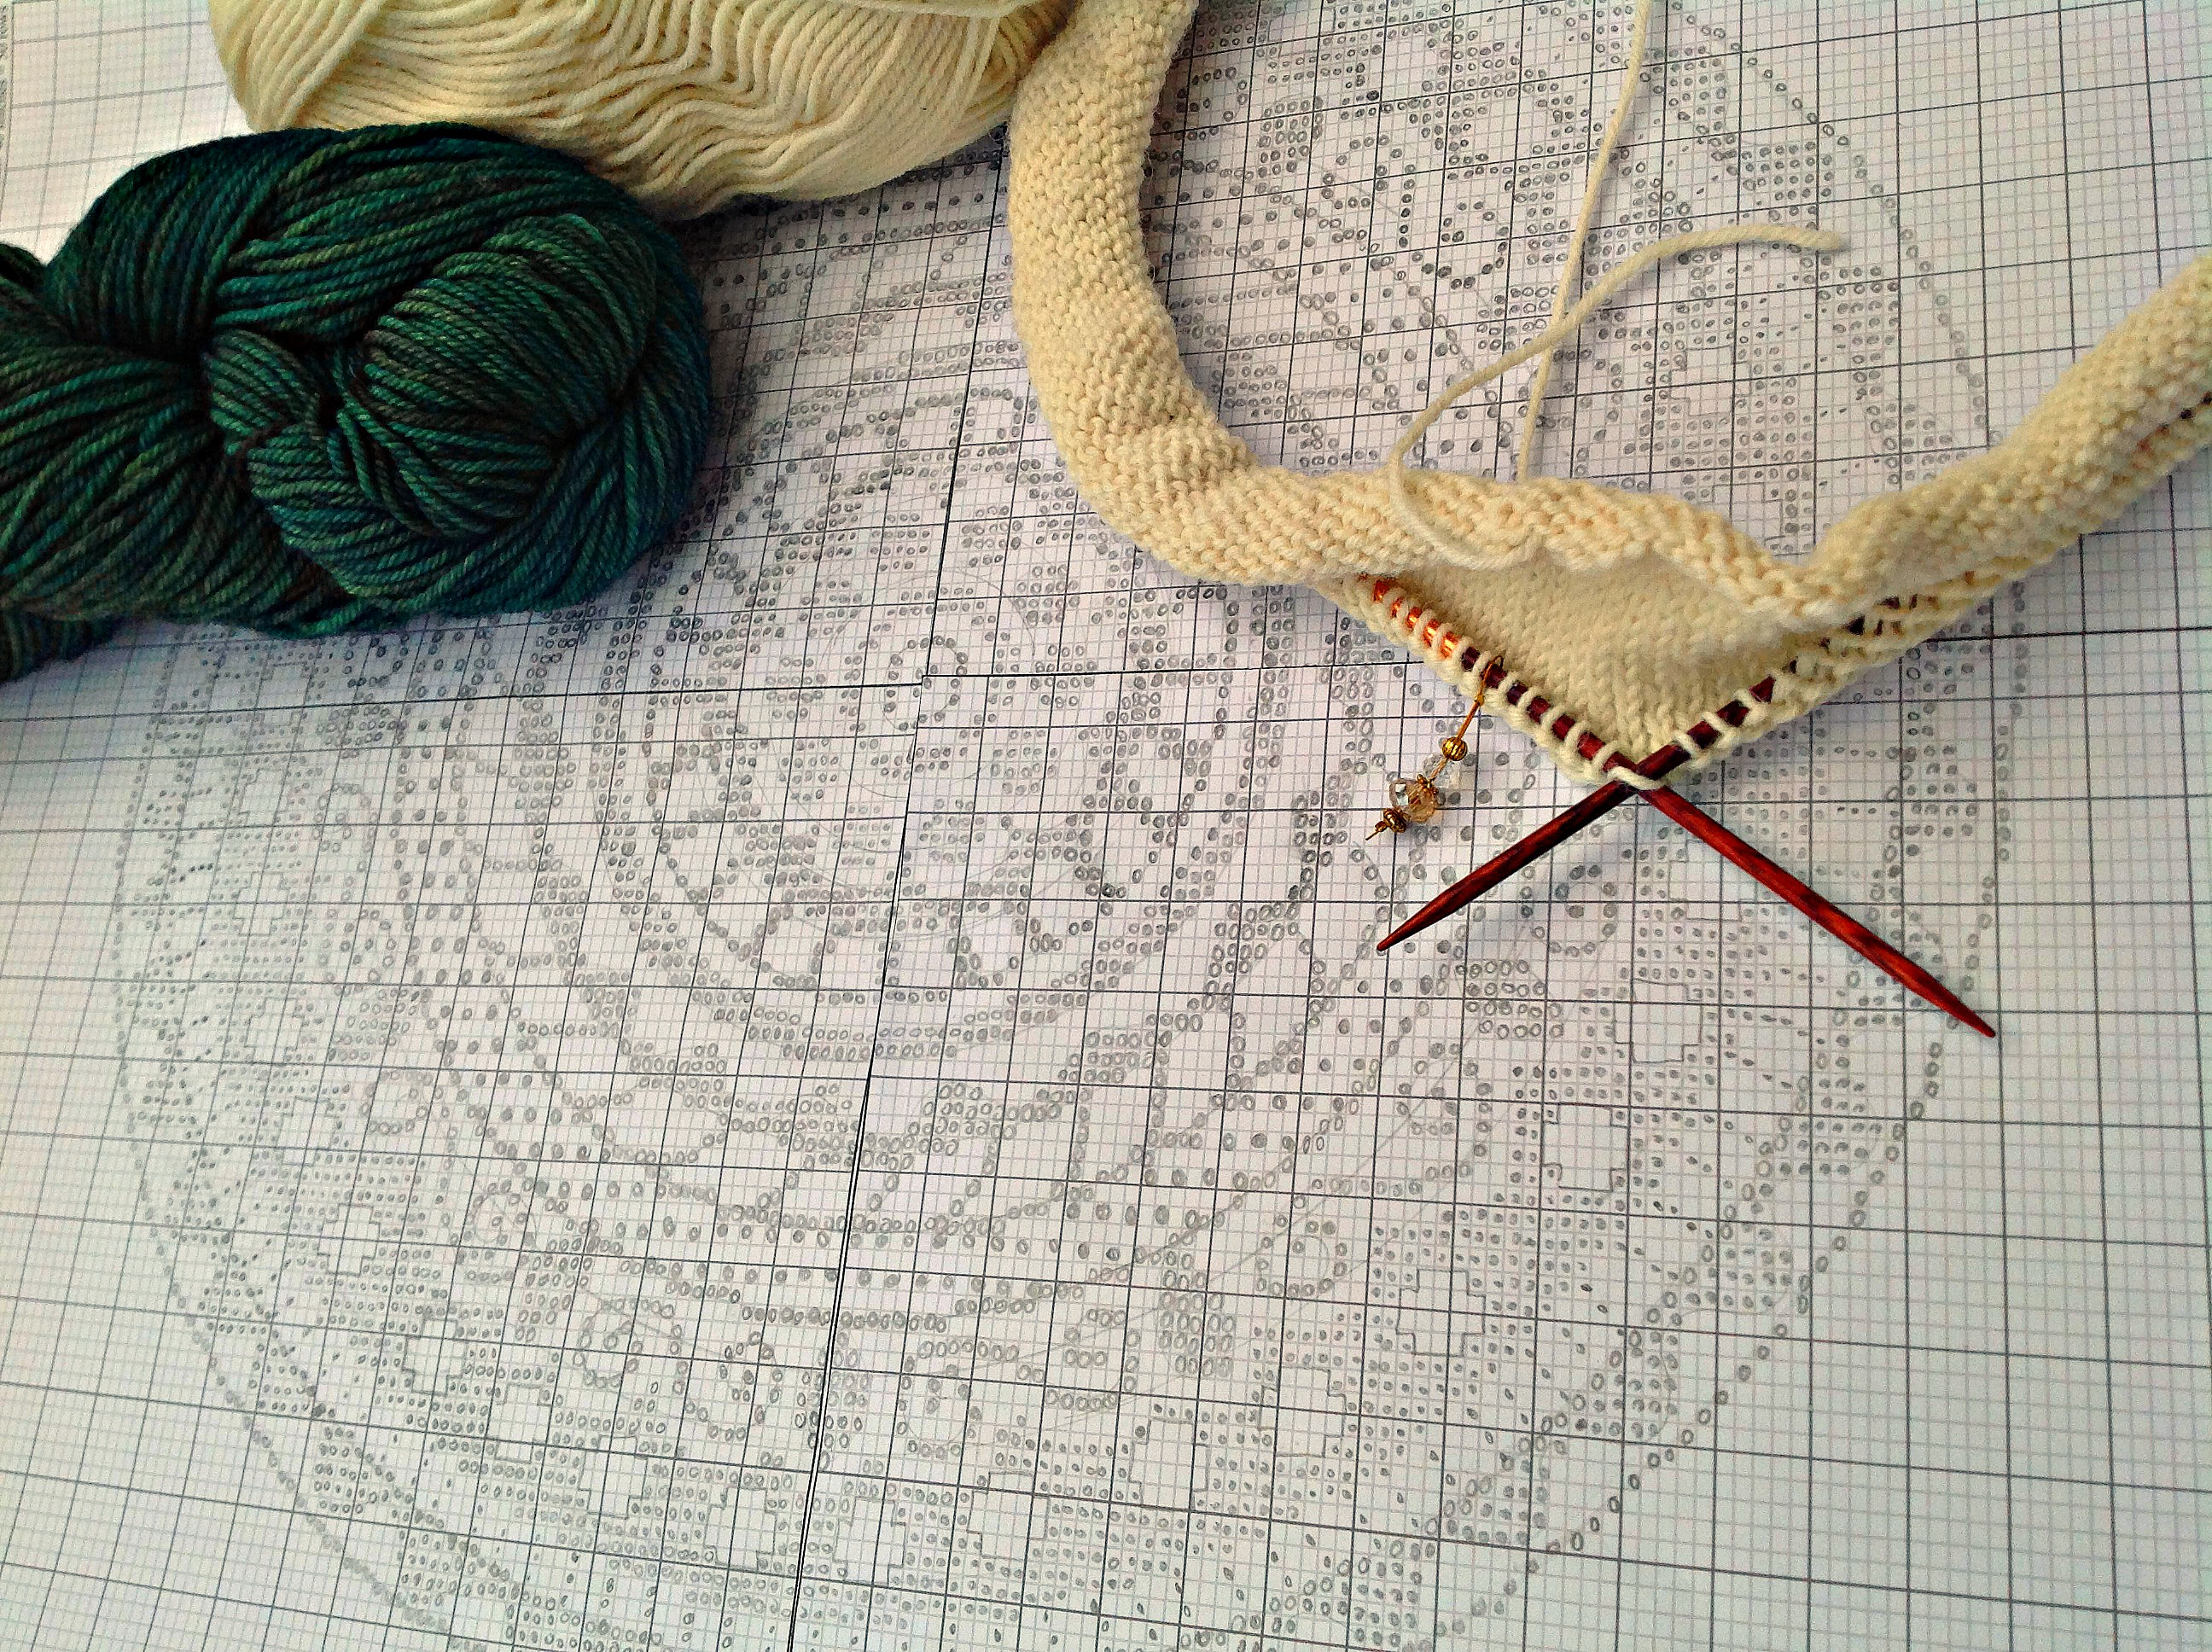 Crochet Patterns Using Mandala Yarn : crochet mandalas the twisted yarn